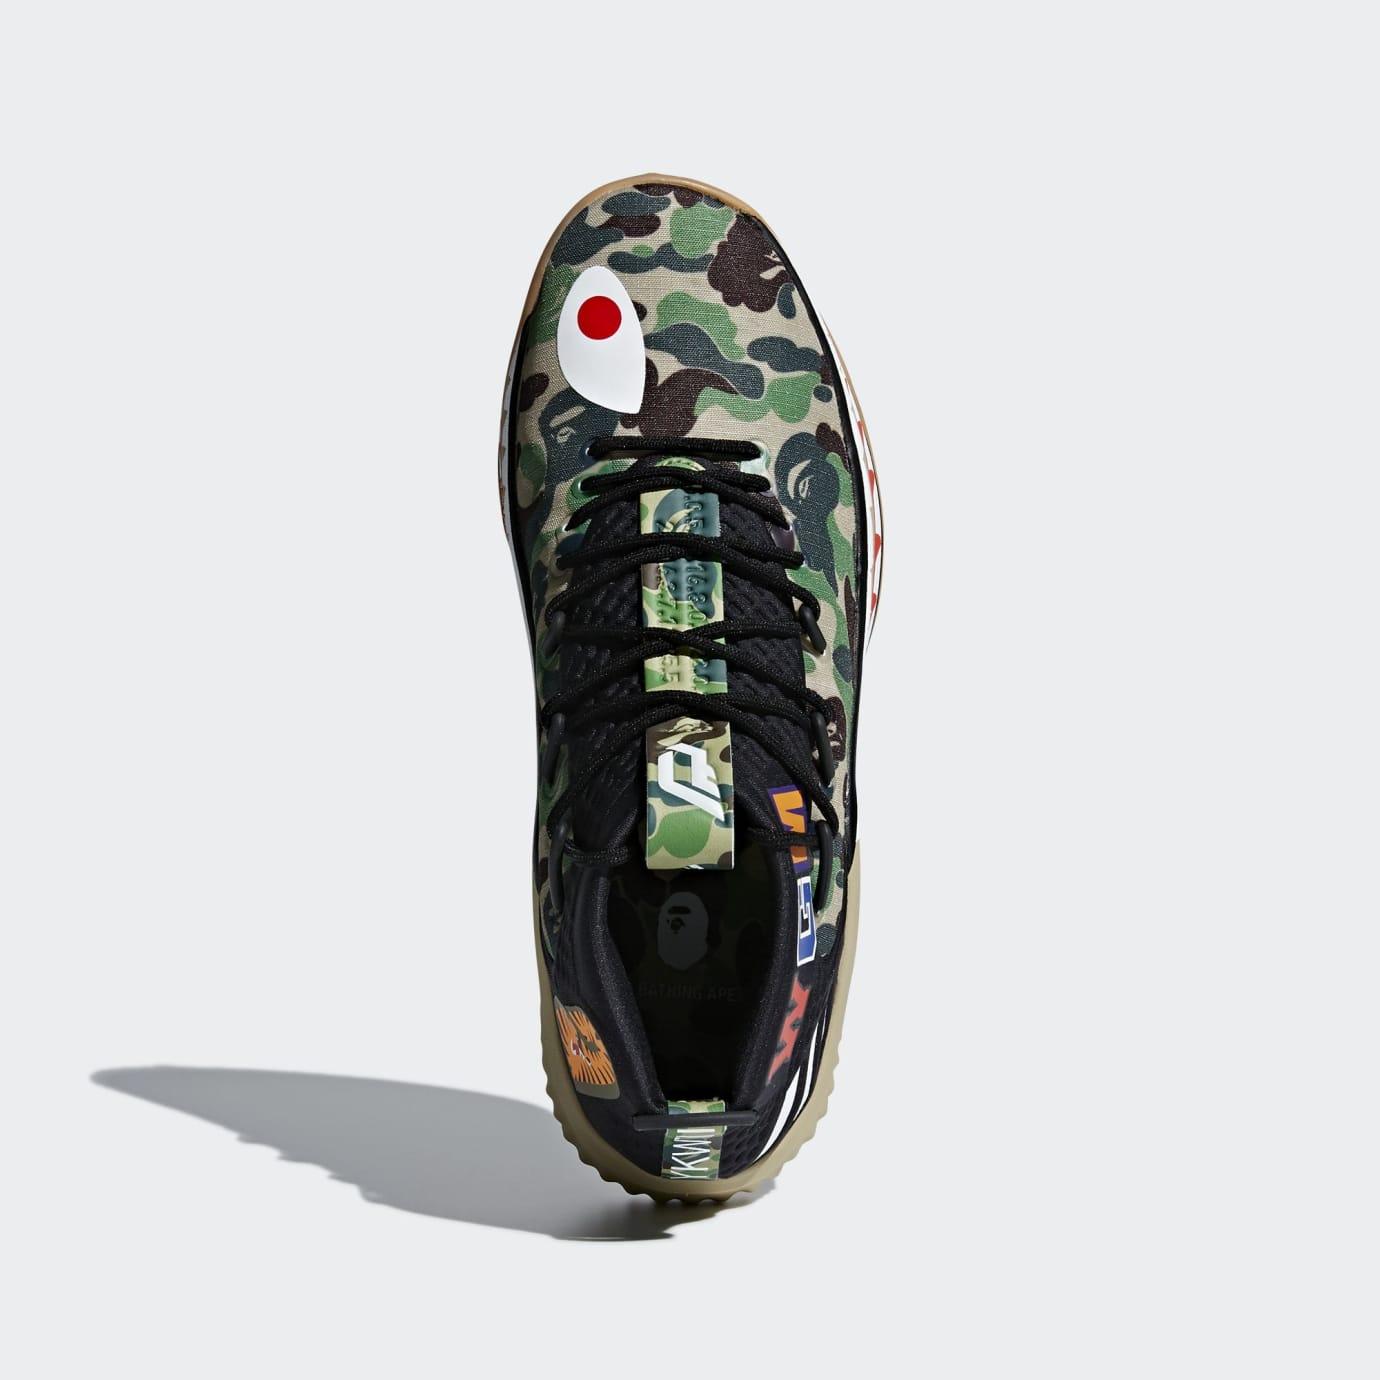 BAPE x Adidas Dame 4 'Green Camo' AP9974 (Top)